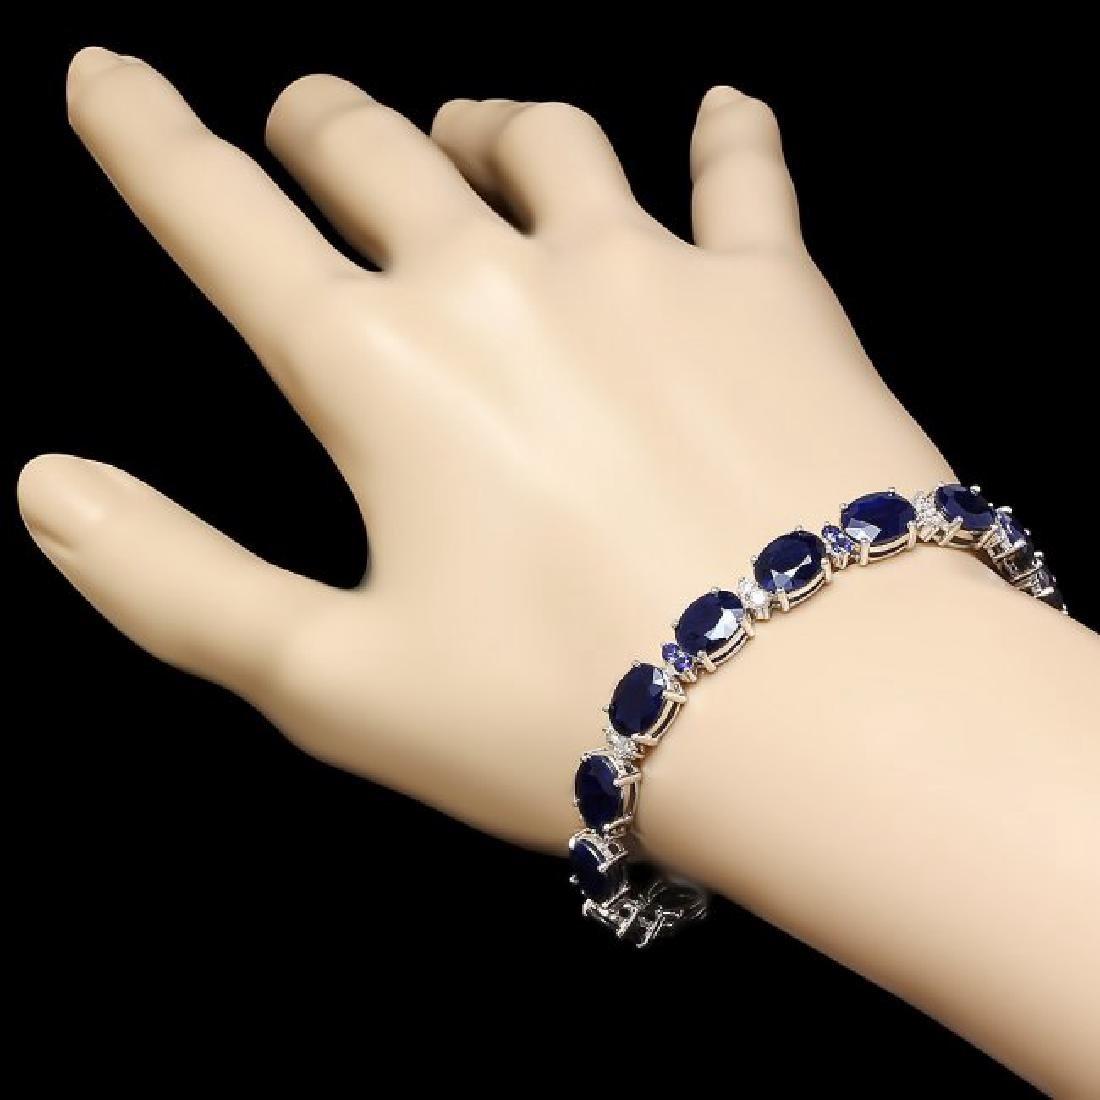 14k Gold 35.8ct Sapphire 0.75ct Diamond Bracelet - 5